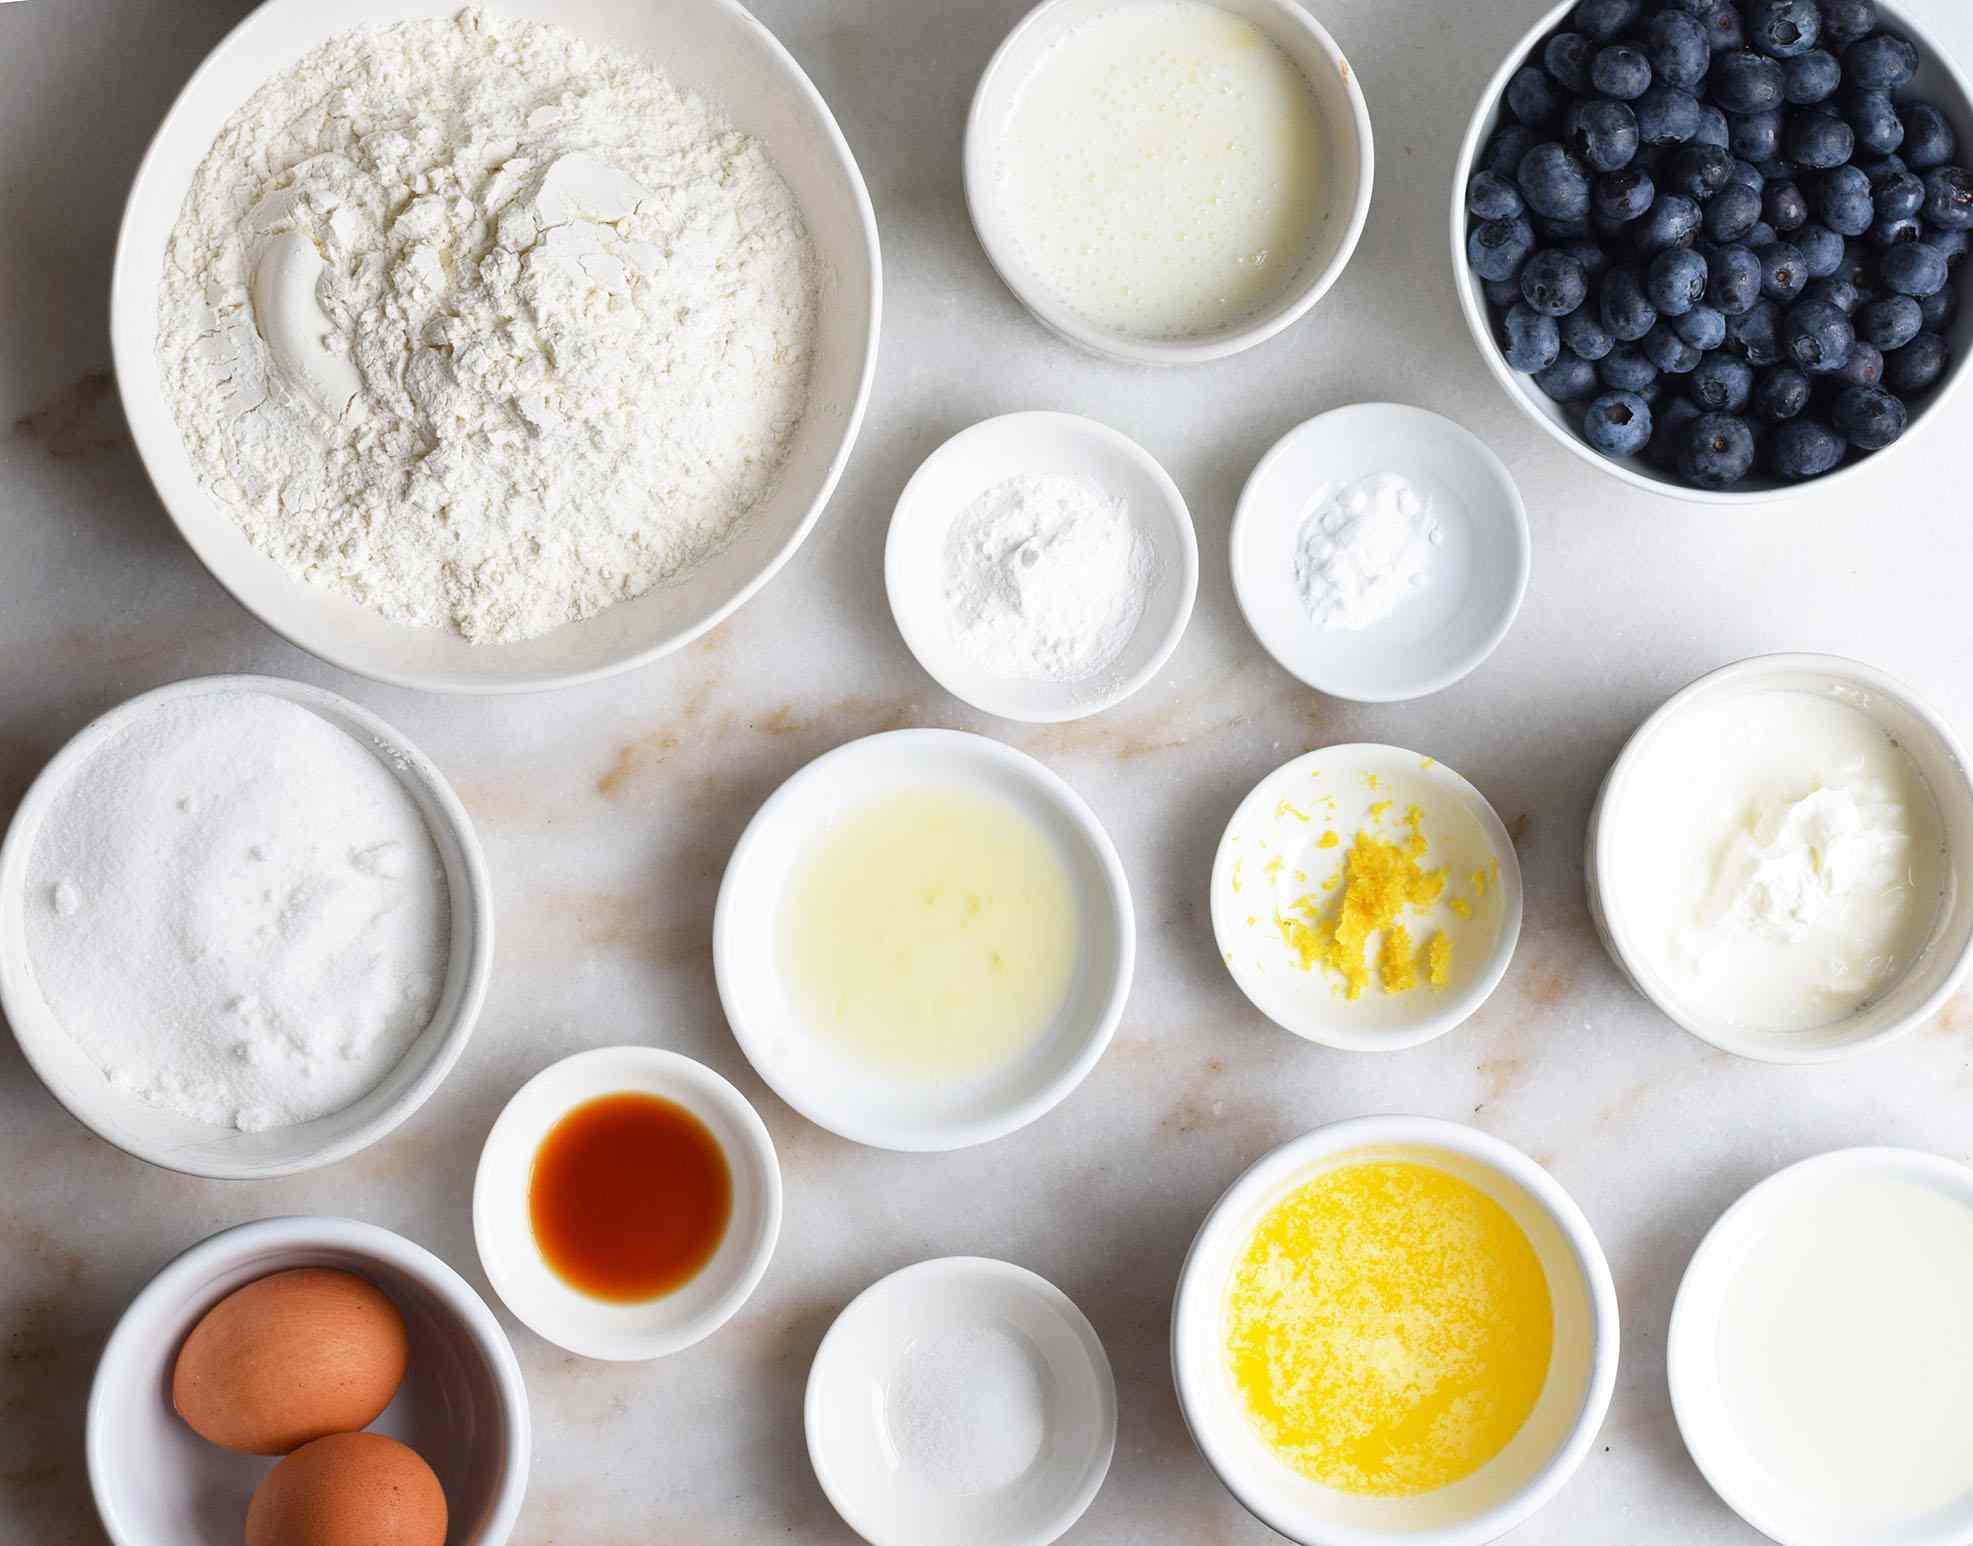 blueberry muffin ingredients